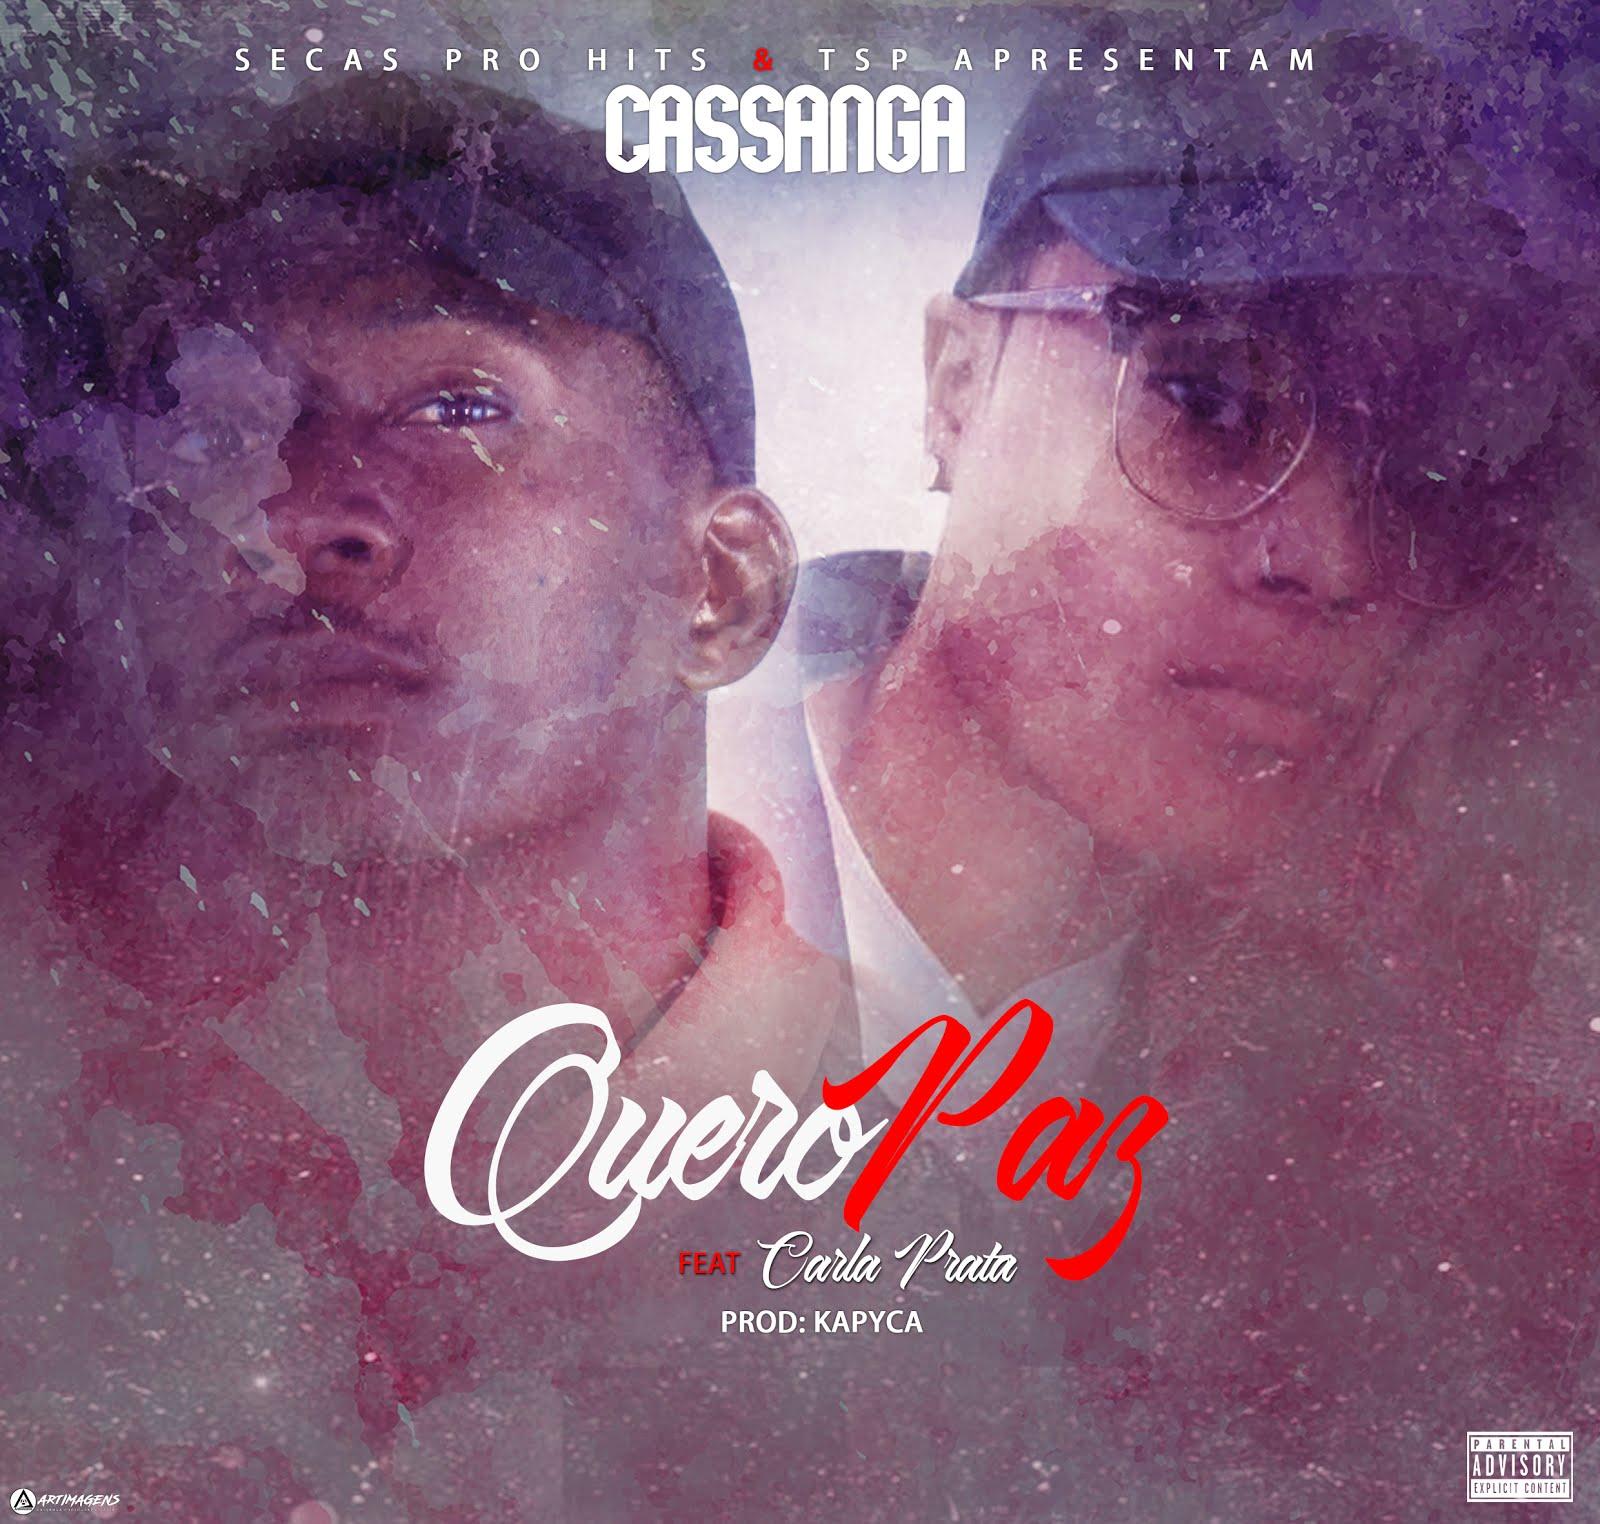 Cassanga Feat Carla Prata - Quero Paz [Download]